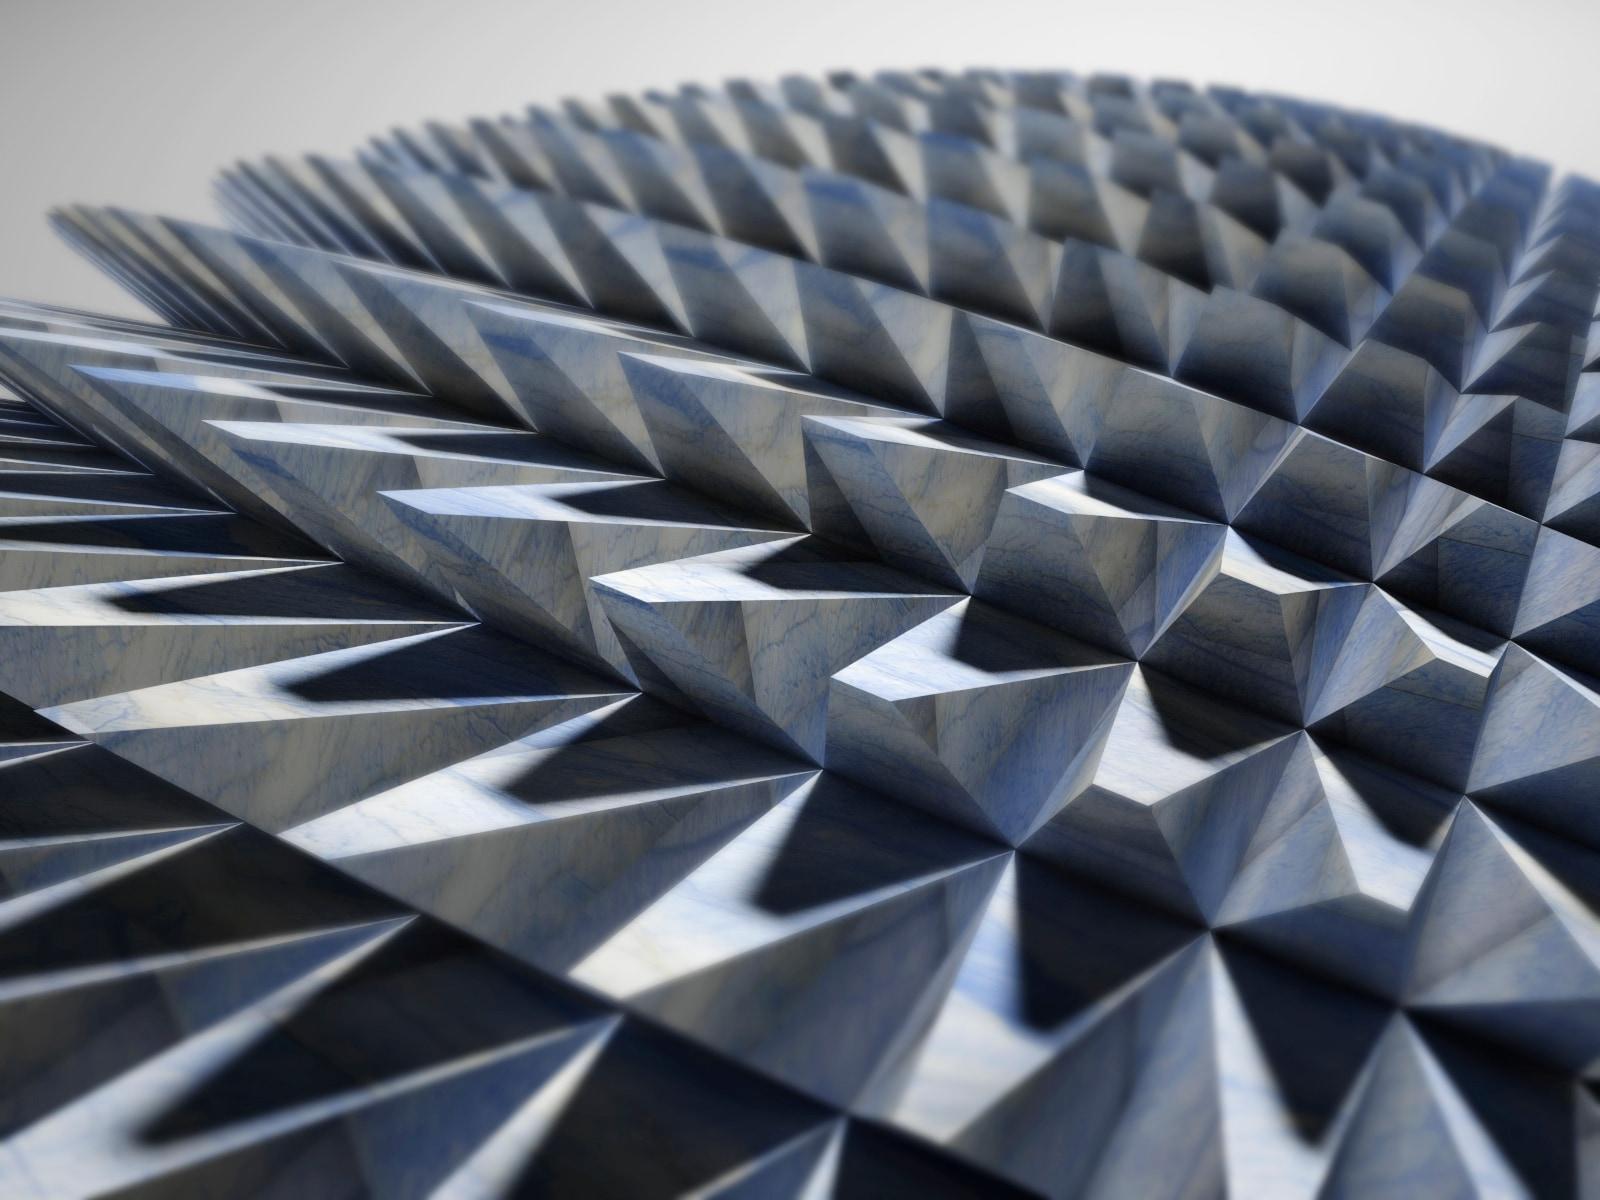 Marmomacc 2015 – Digital Lithic Design